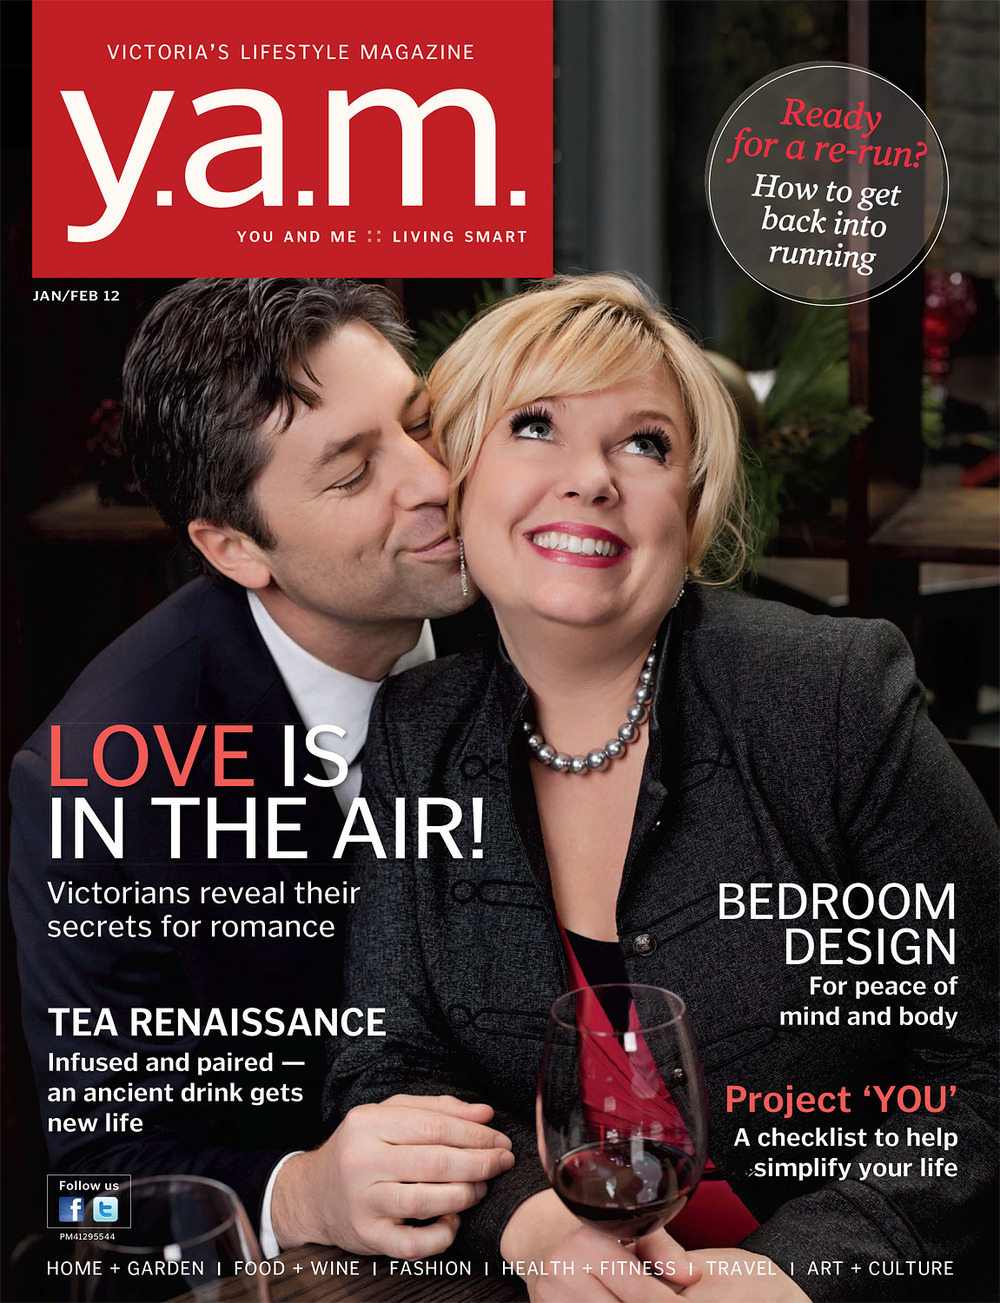 yam-feb-2012-cover.jpg